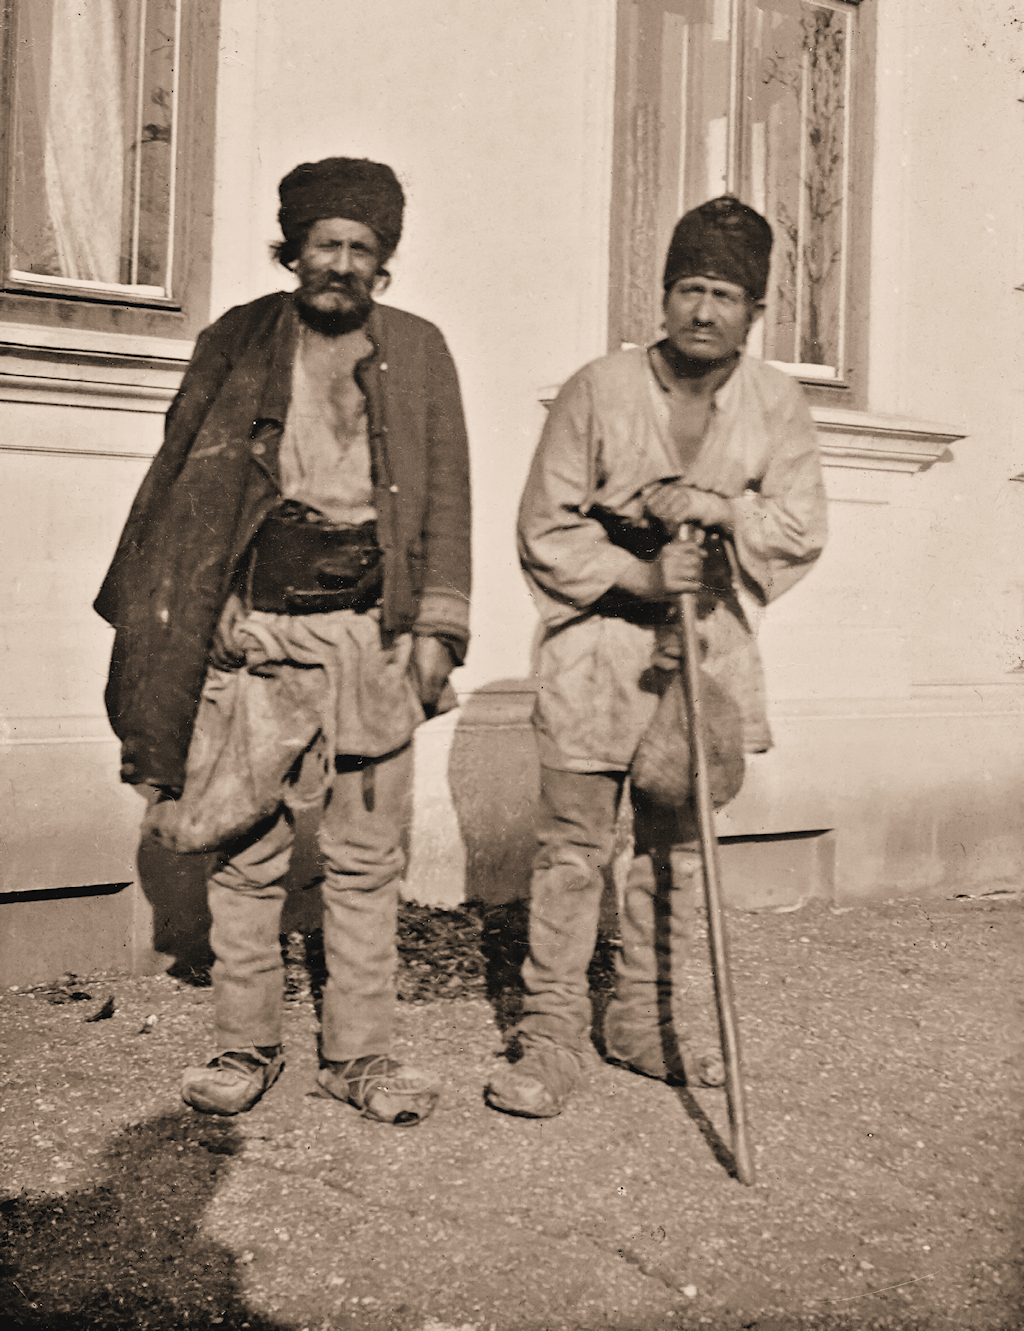 Zigeuner, Januar 1900